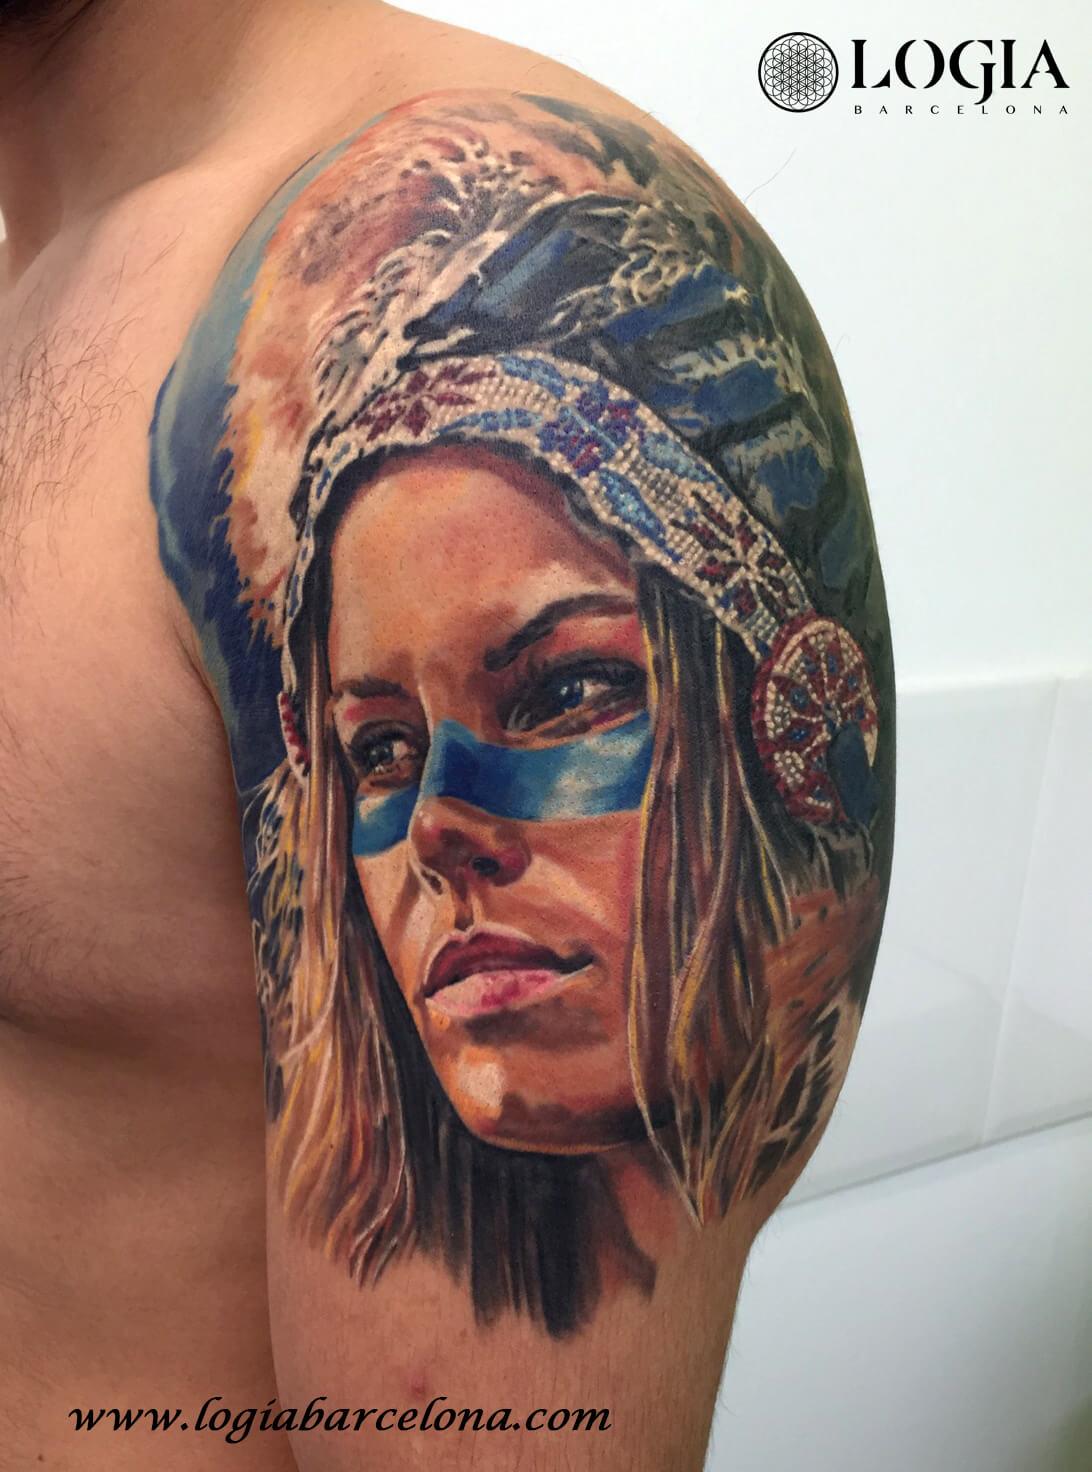 Tatuajes Indios Tattoos De Indios Americanos Logia Tattoo Barcelona